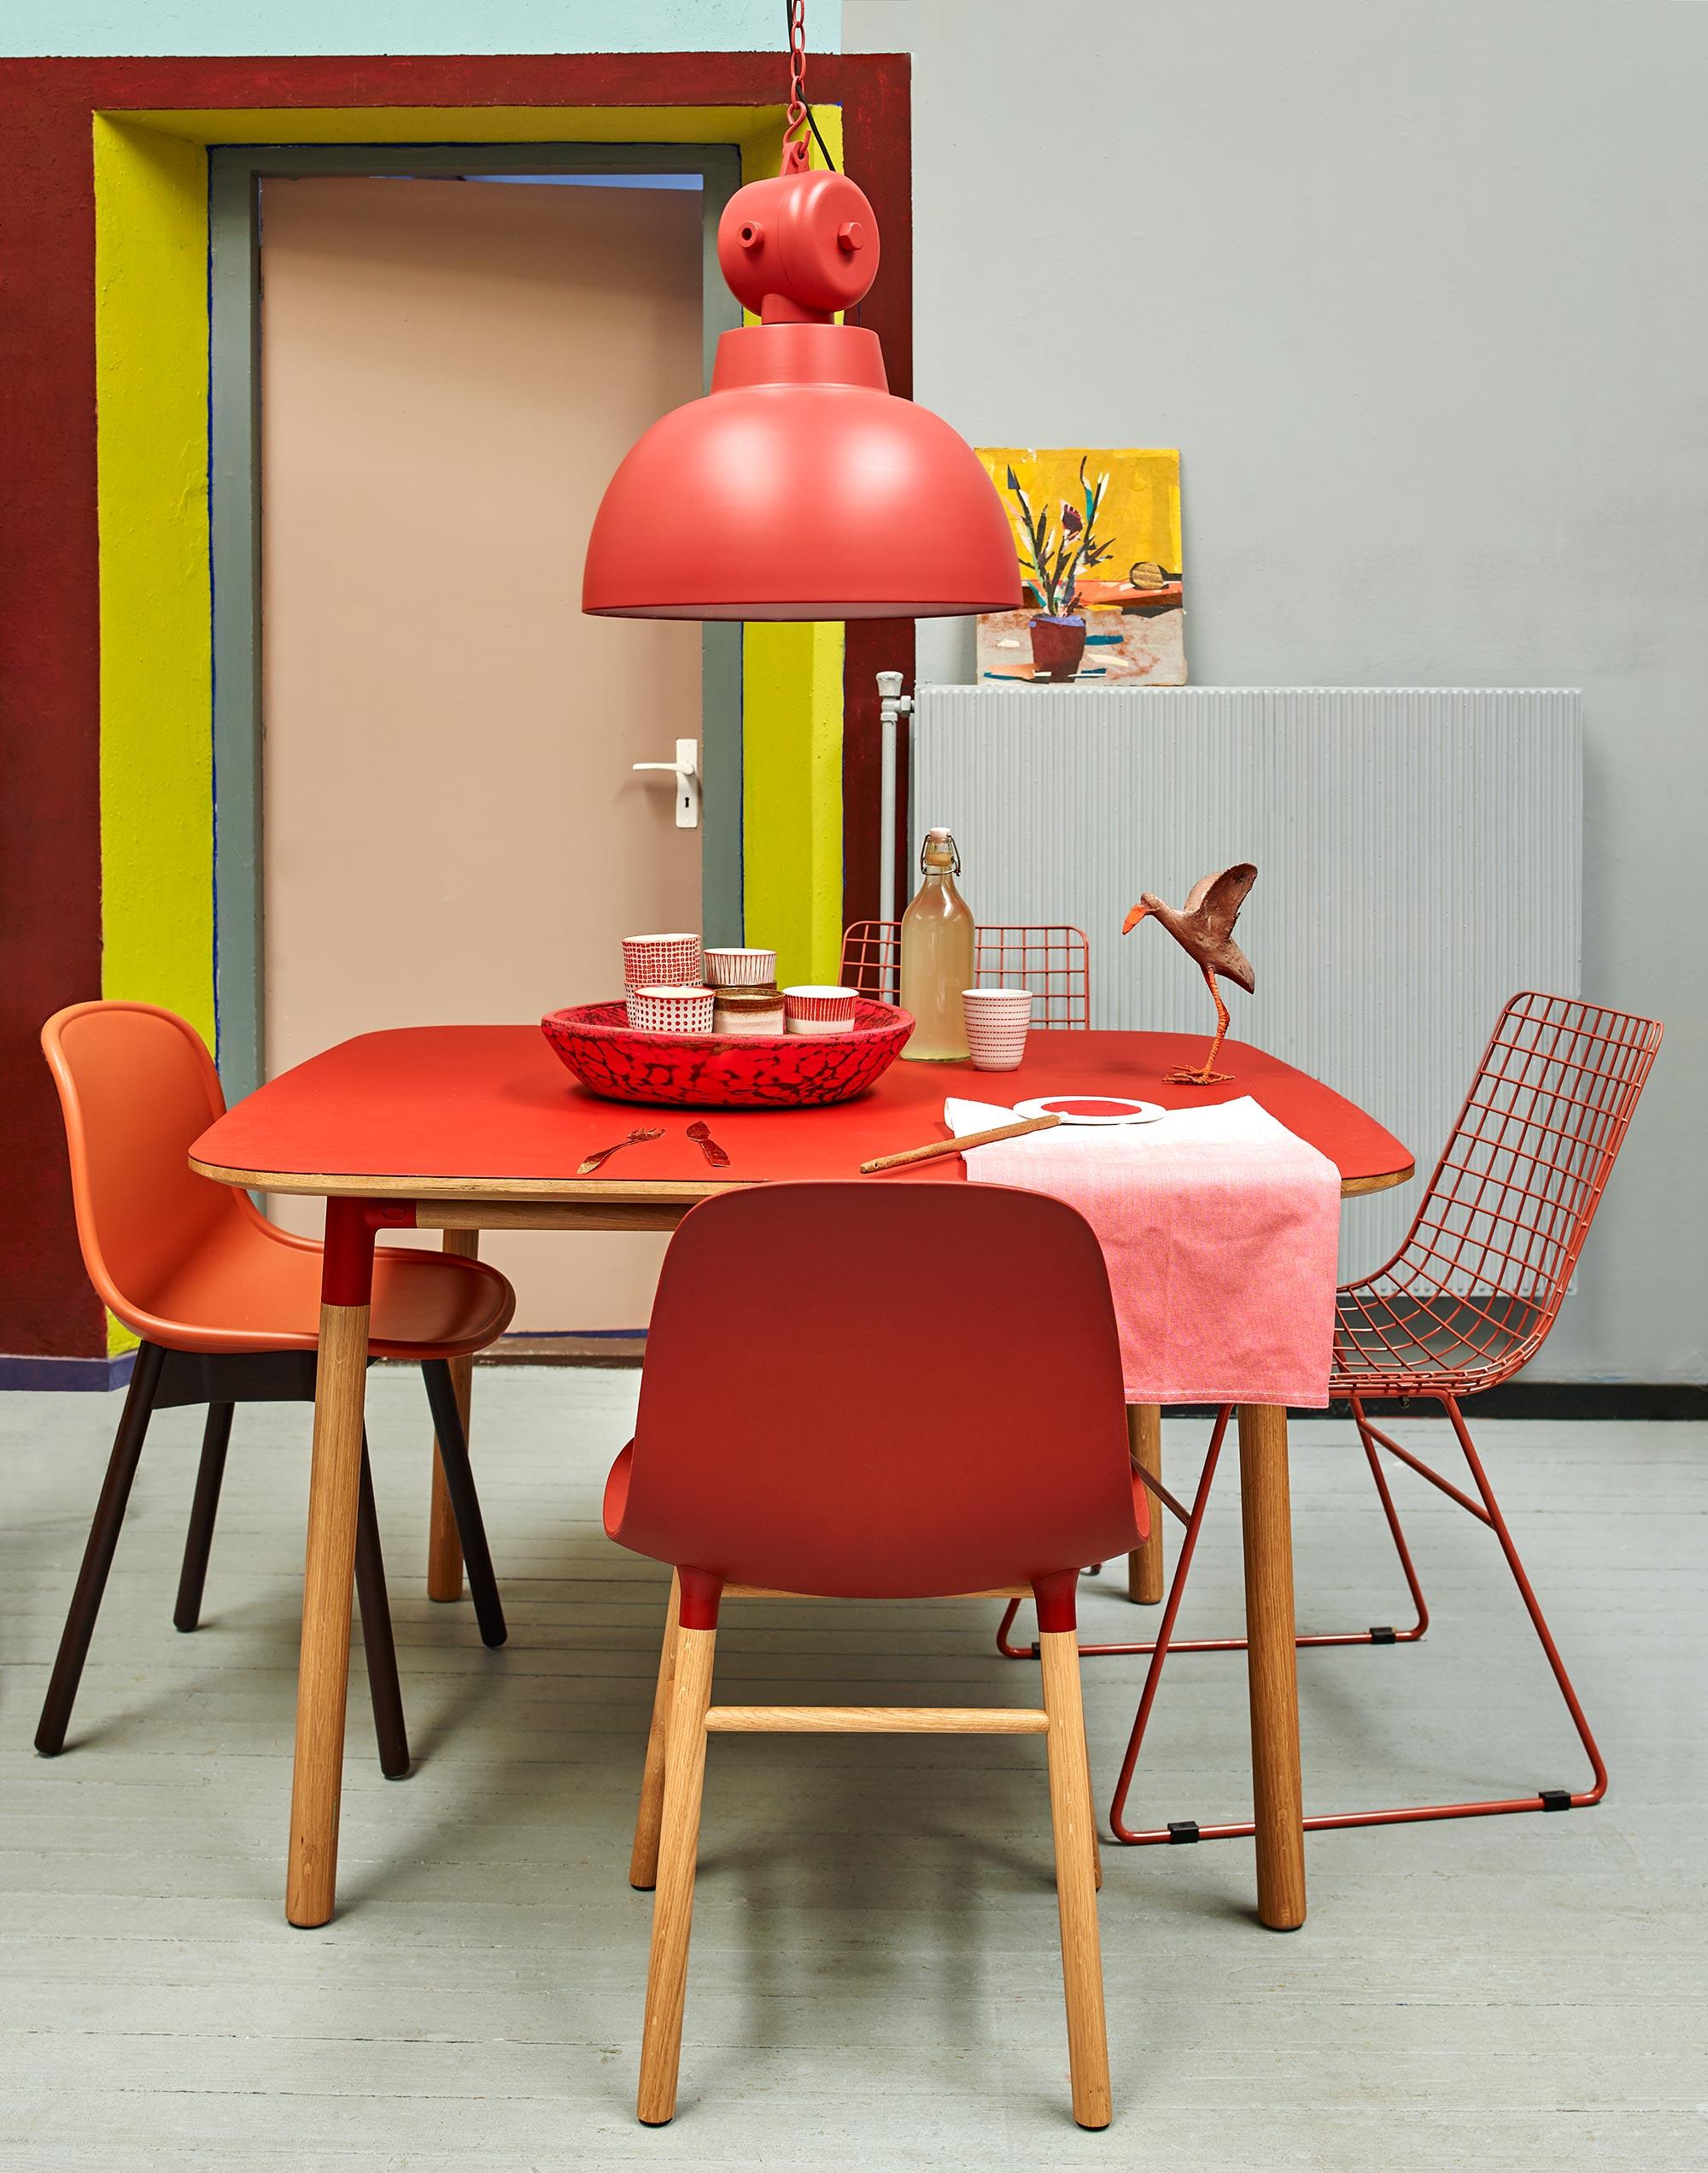 chaises rouges